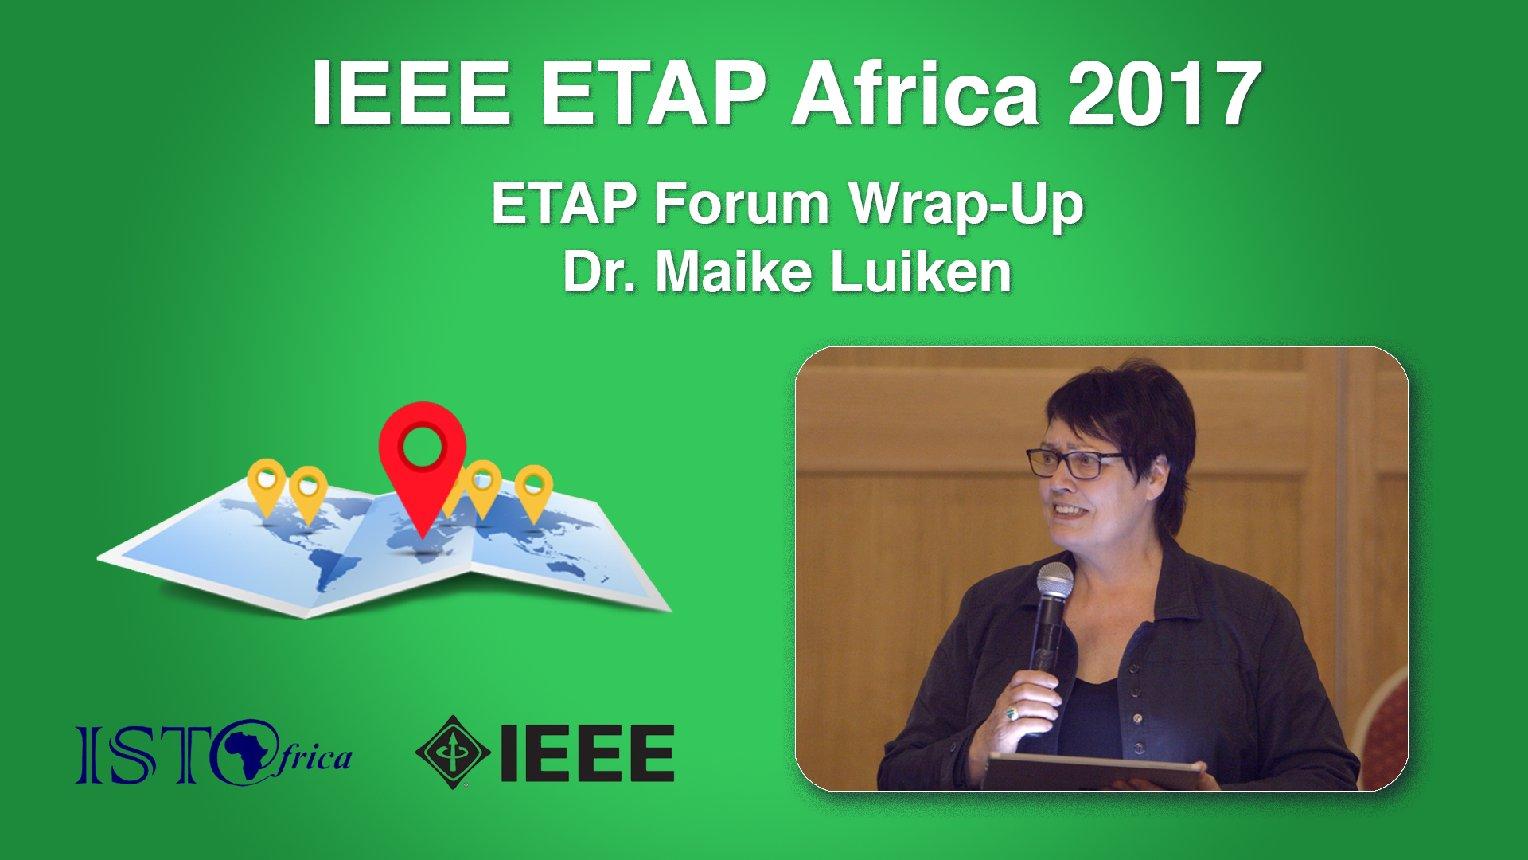 ETAP Forum Wrap-Up: Maike Luiken - ETAP Forum Namibia, Africa 2017